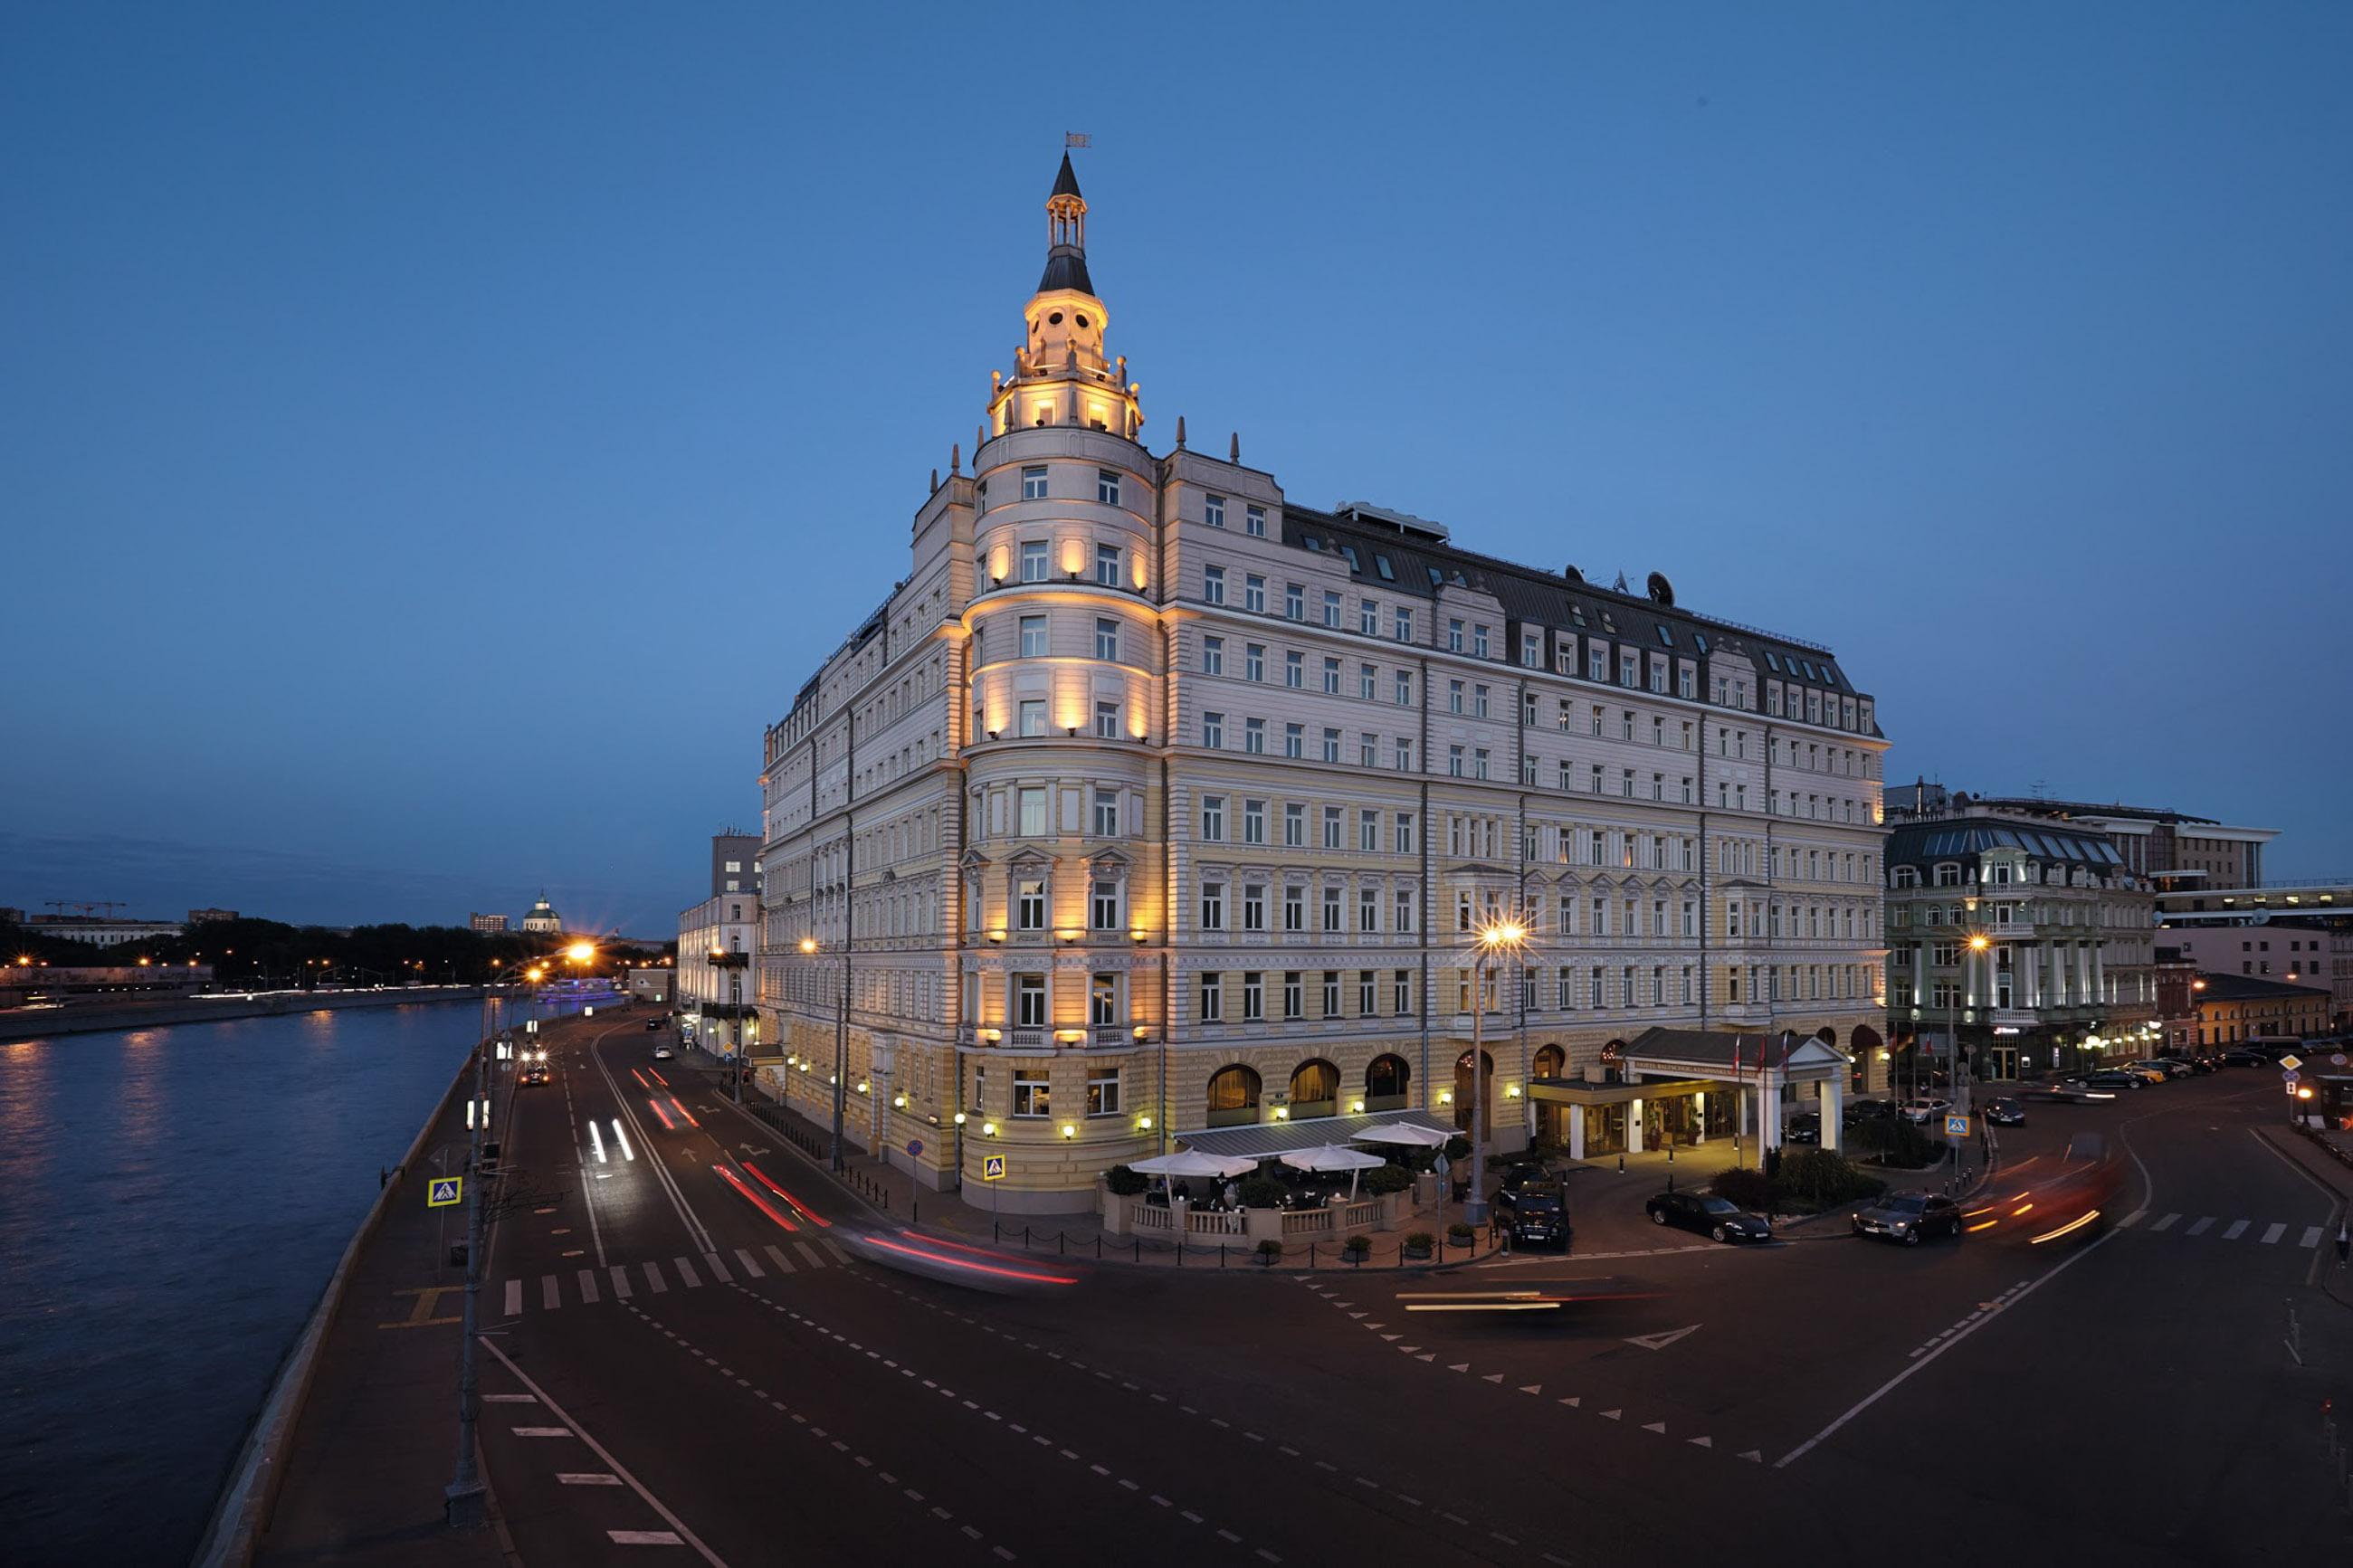 https://bubo.sk/uploads/galleries/16268/kempinski_moskva_rusko_hotel-baltschug-kempinski-moscow_12604_print.jpg